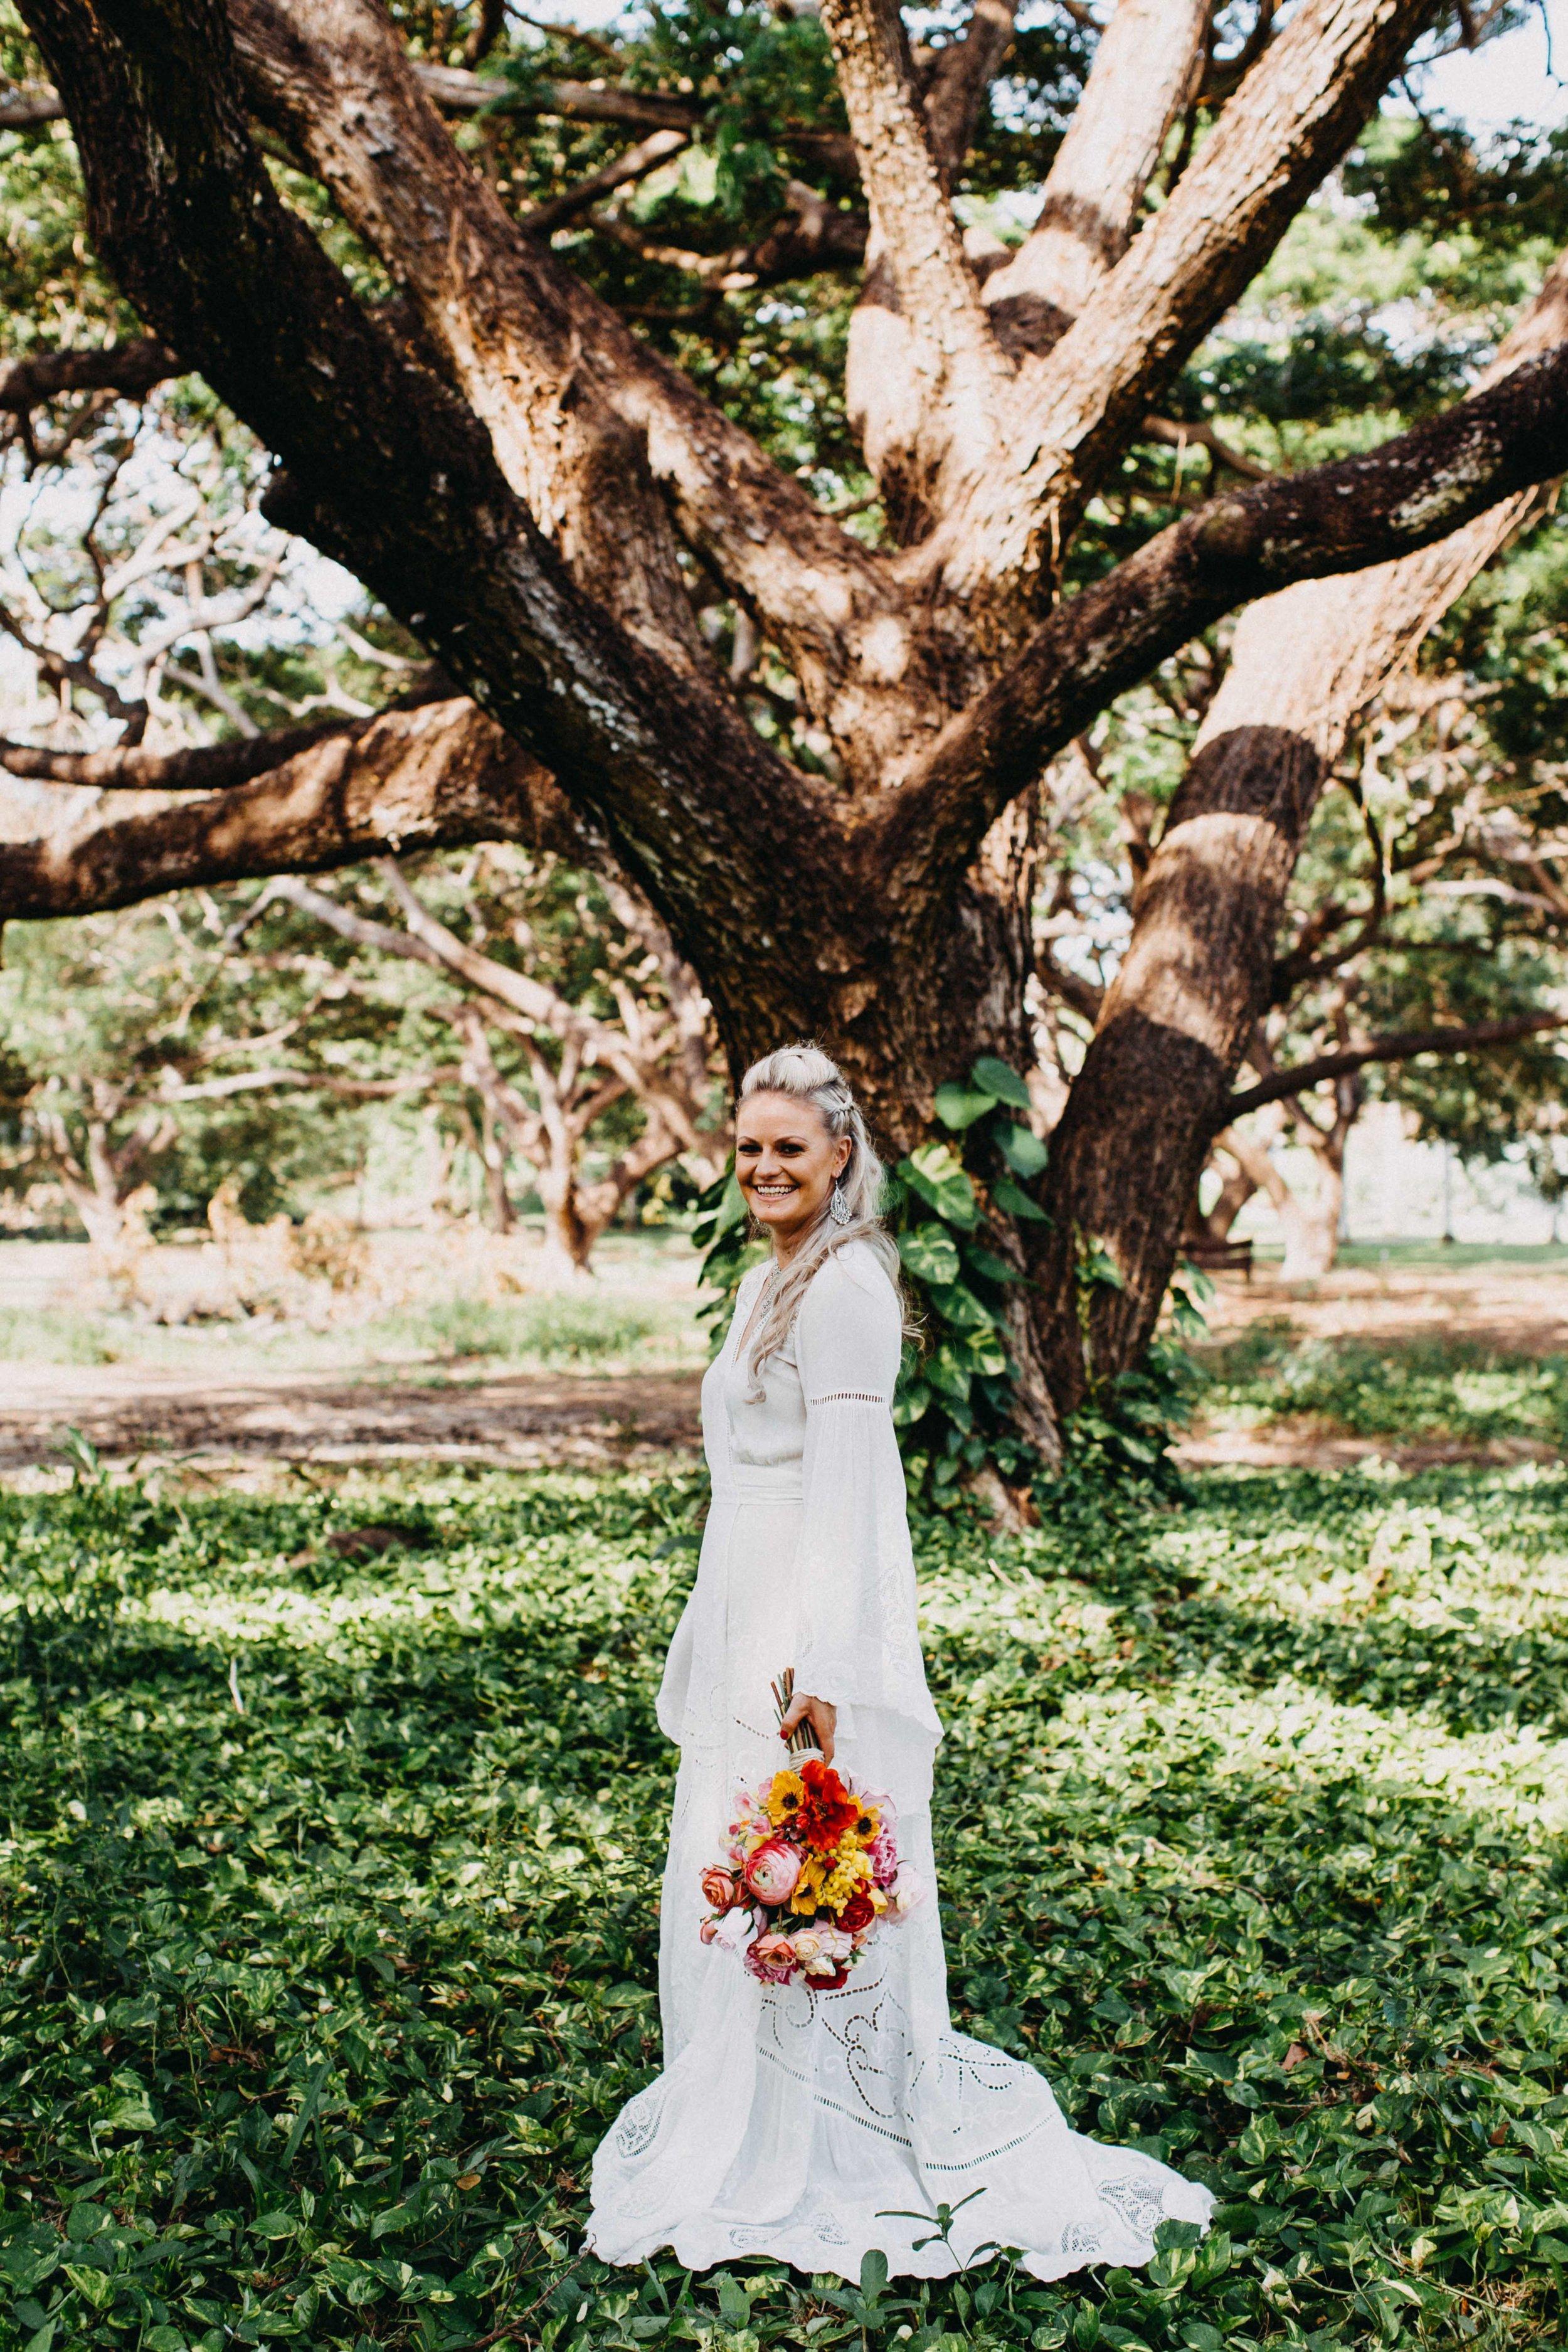 darwin-elopement-wedding-beach-camden-photography-www.emilyobrienphotography.net-27.jpg